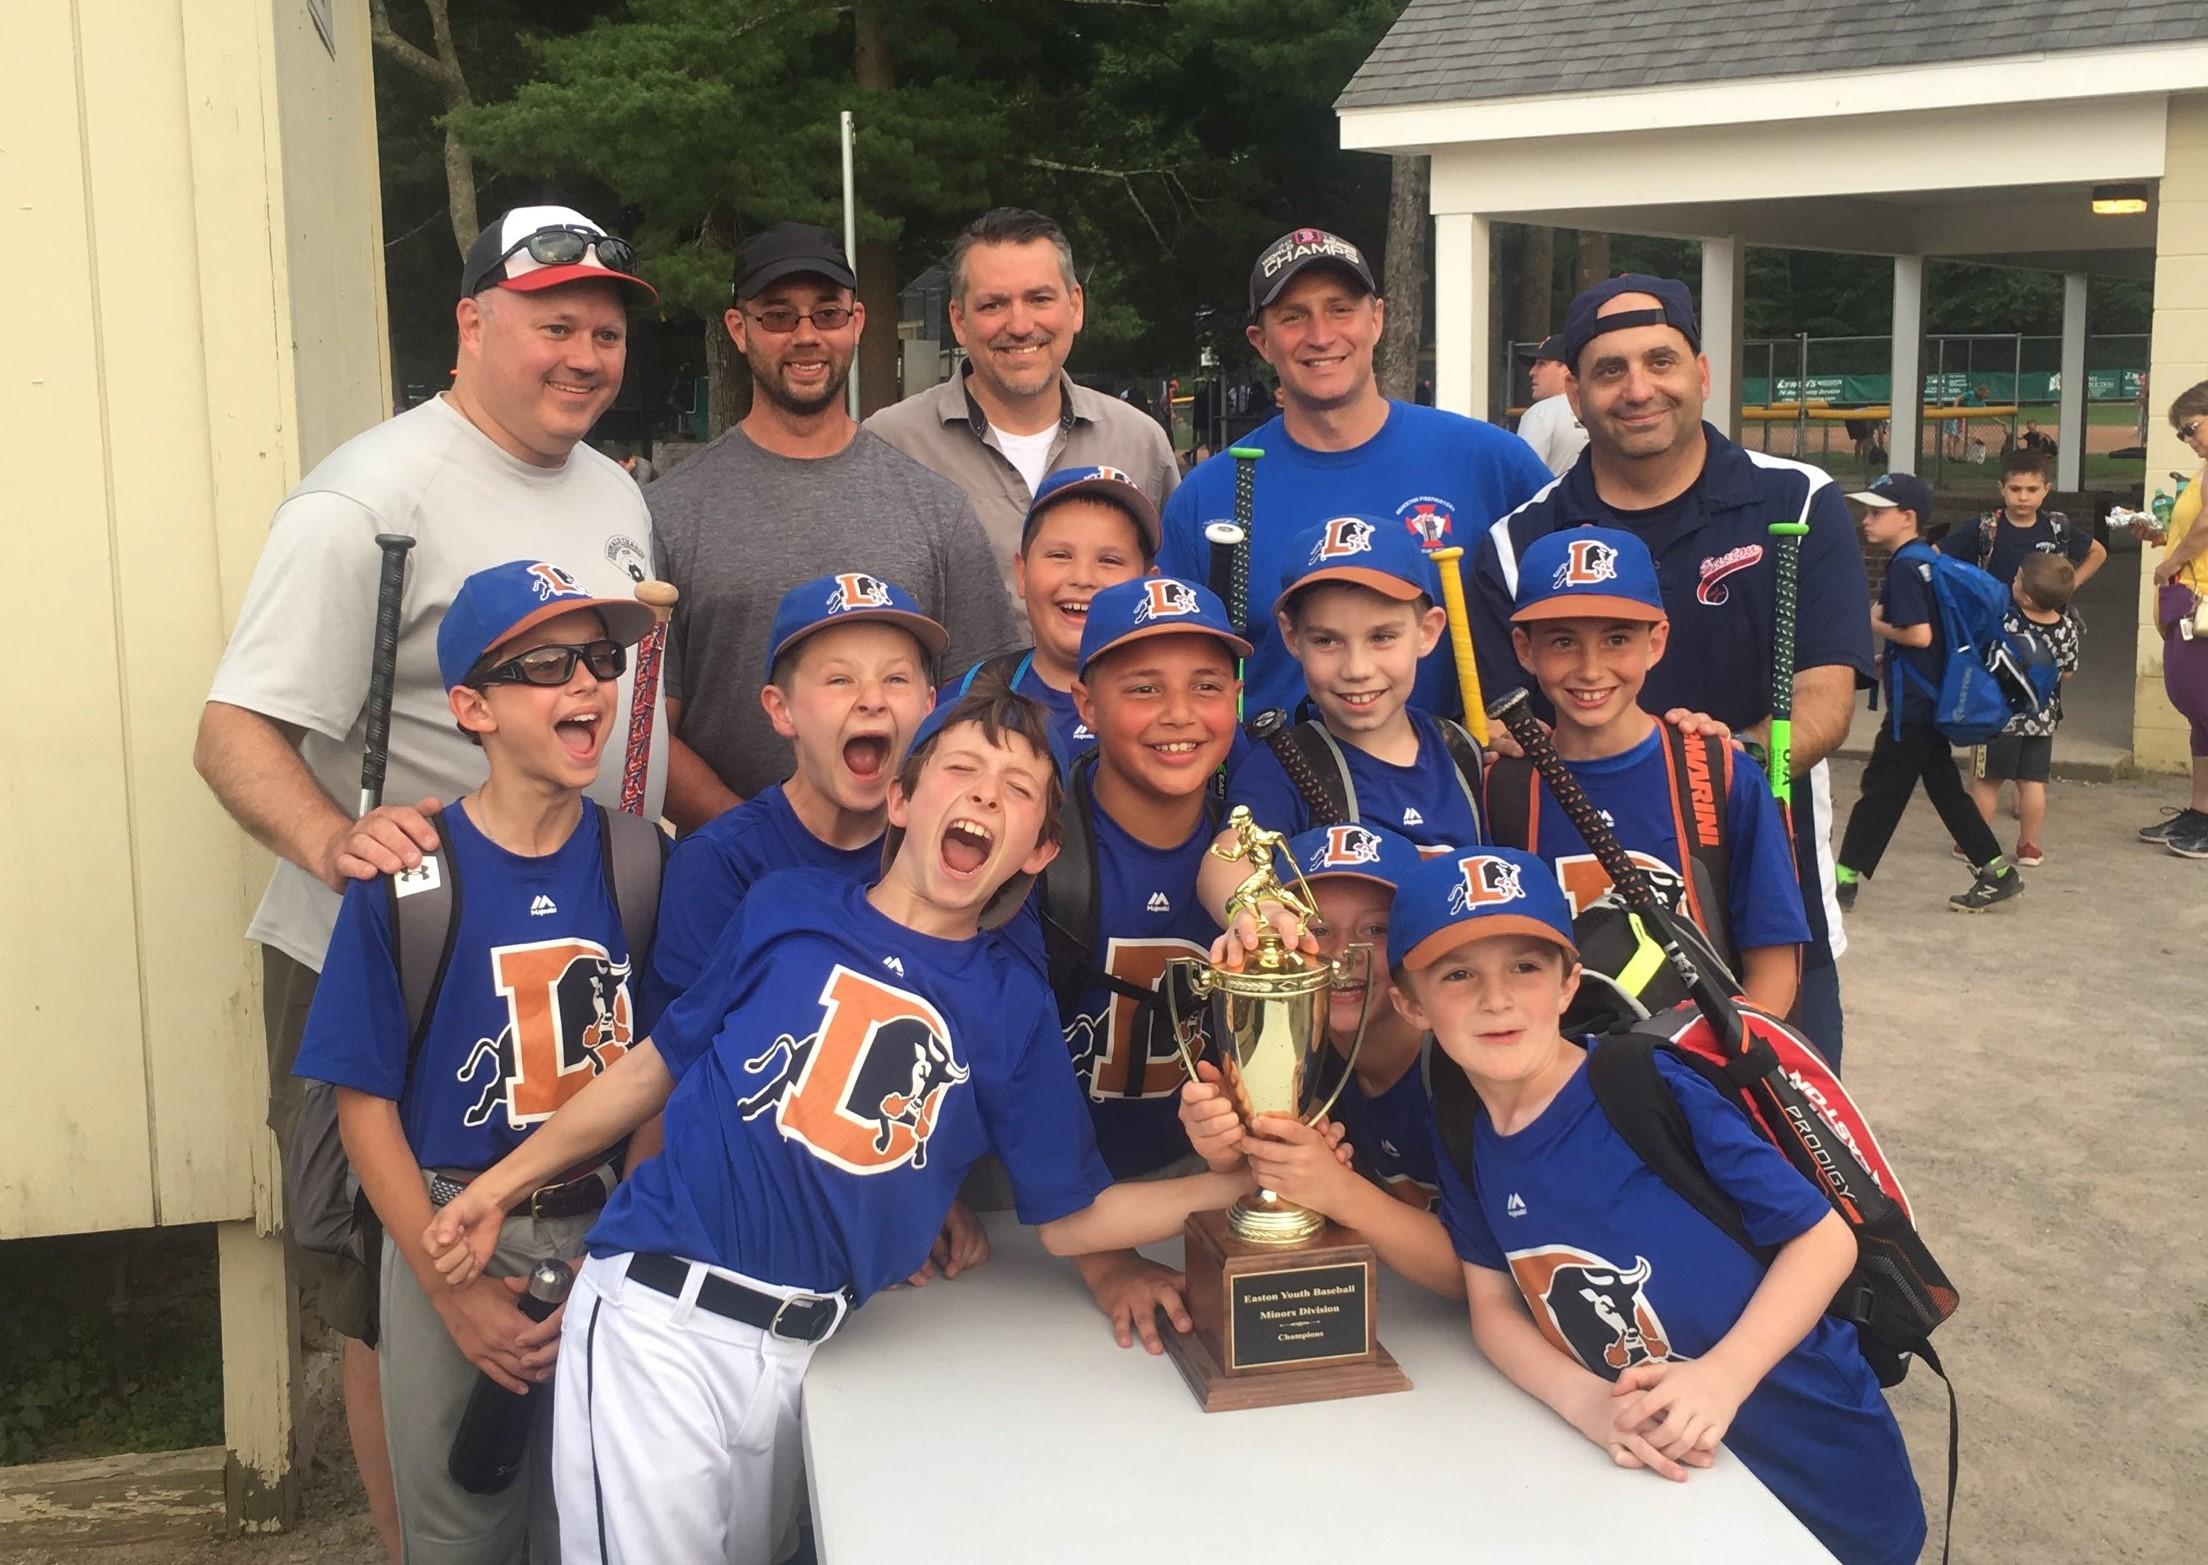 2019 Minors Champions